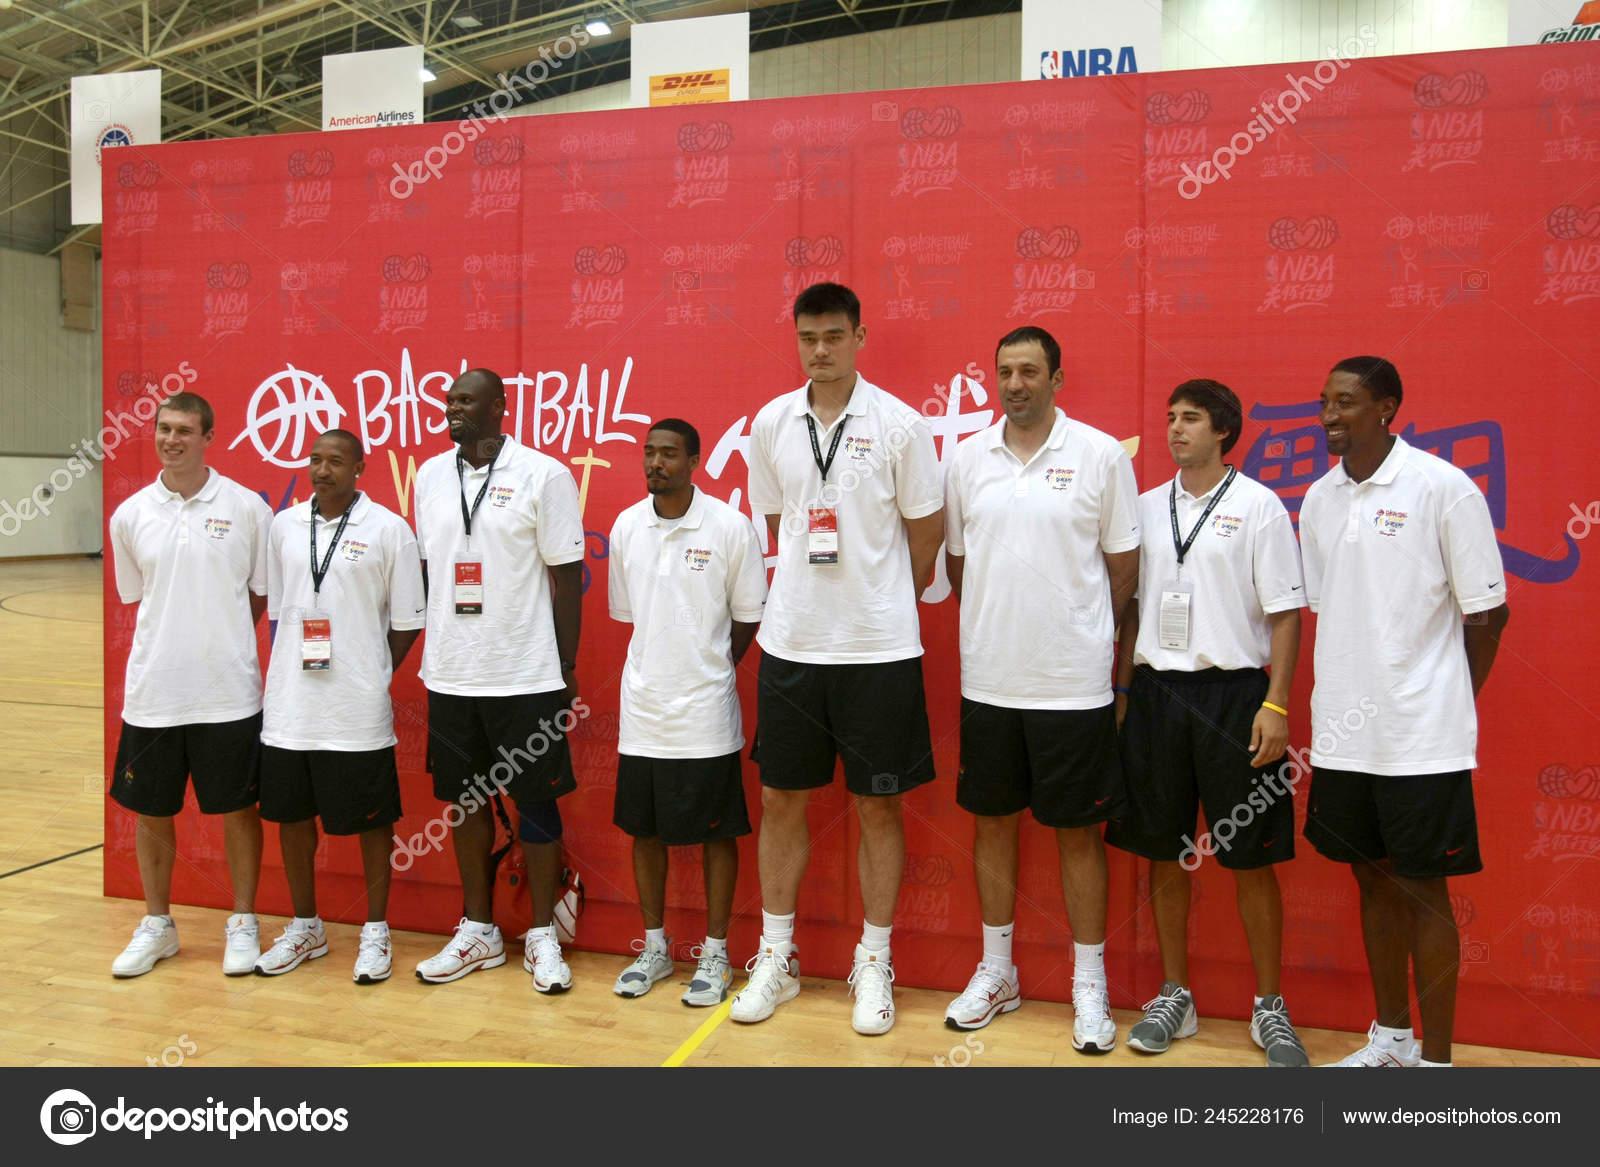 Superestrella Nba Chino Yao Ming Cuarto Derecha Jugador Anterior Nba ...